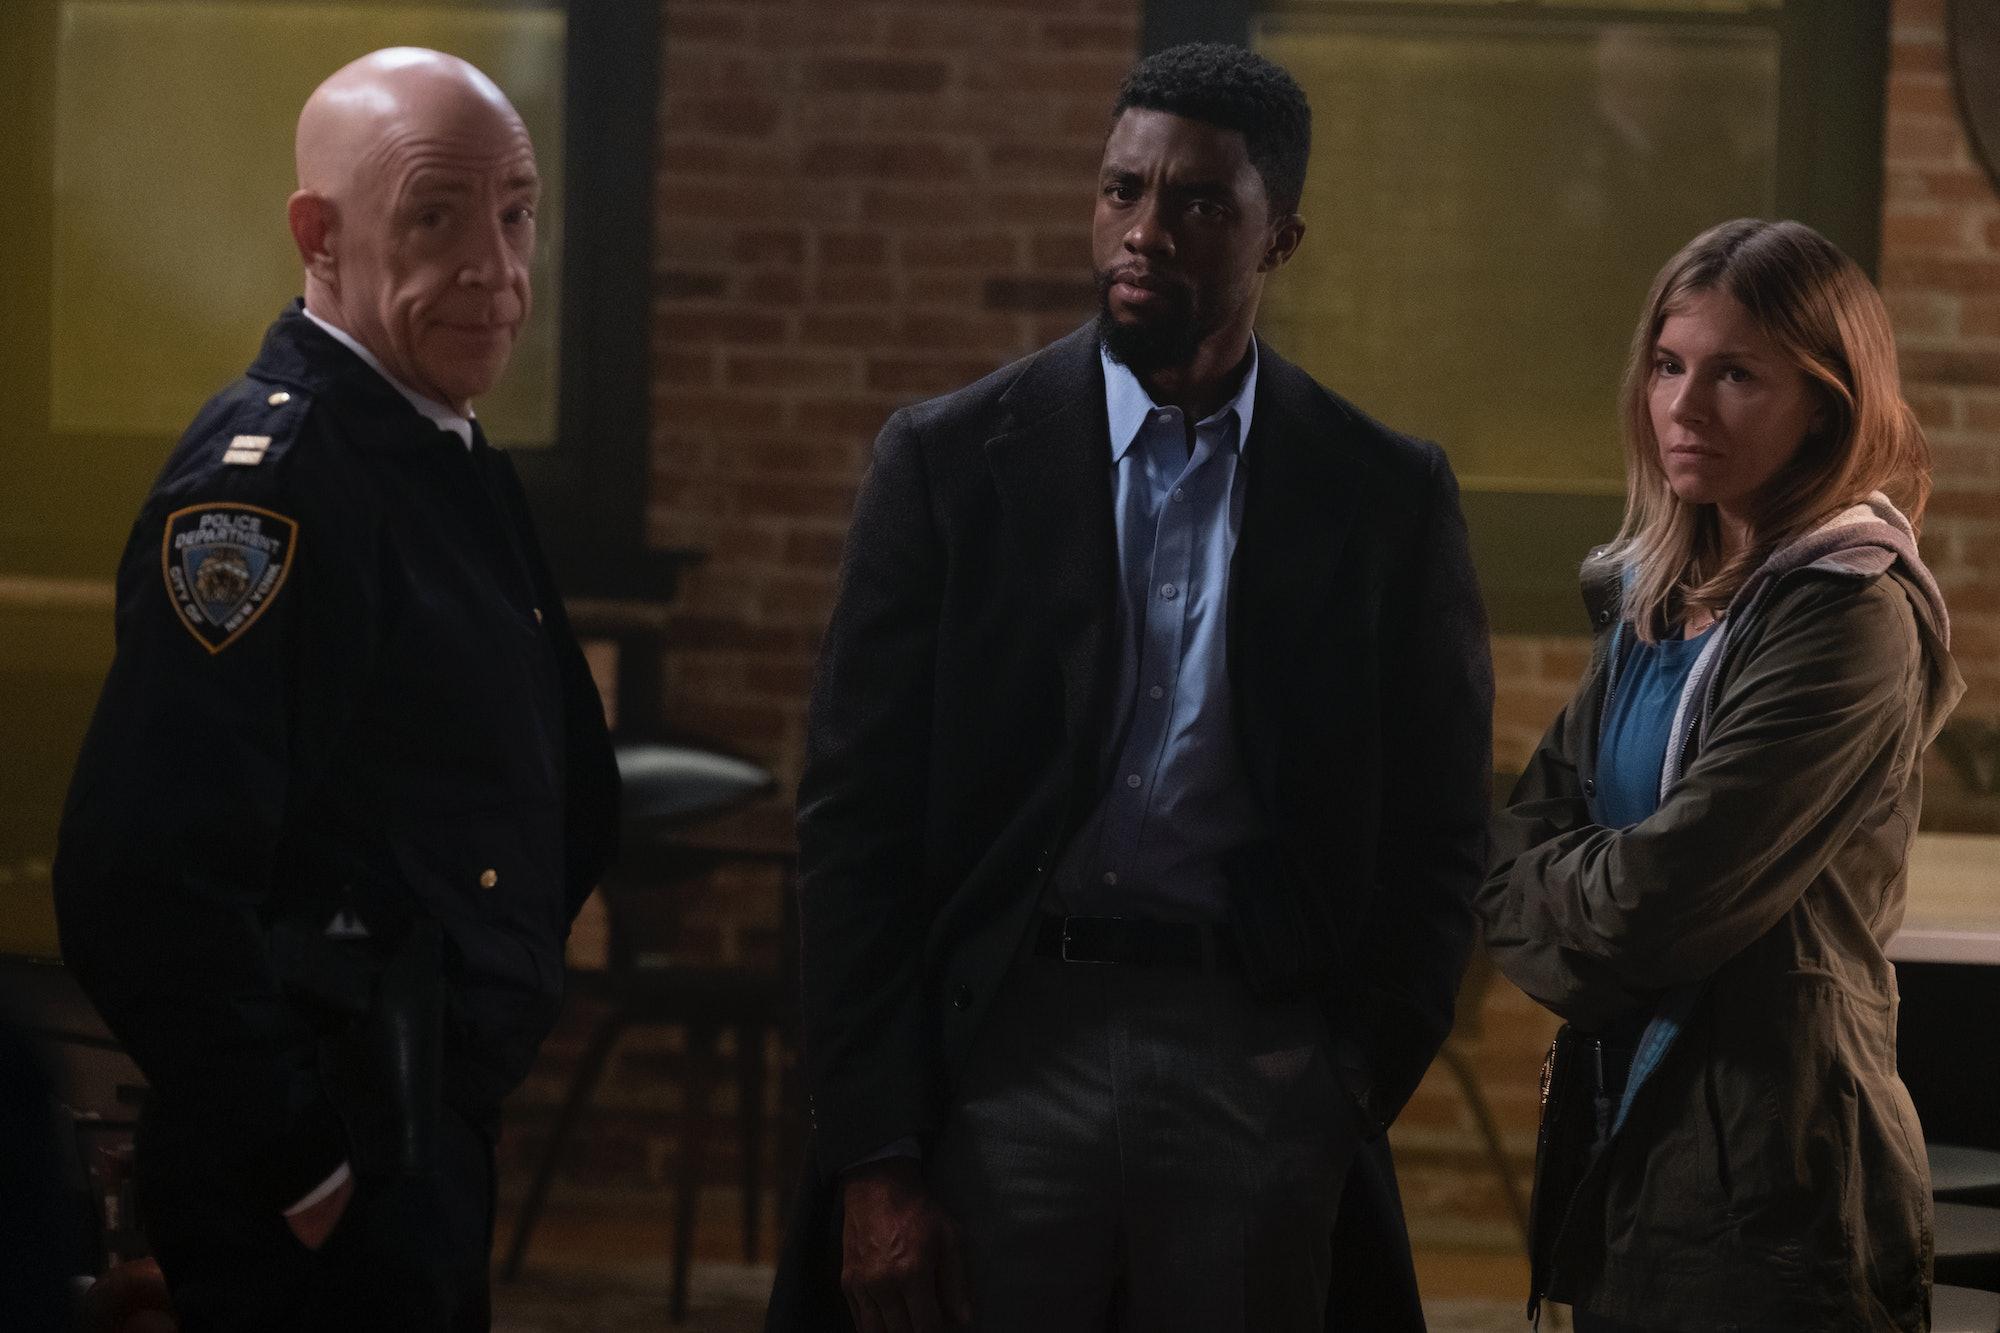 '21 Bridges' review stars J.K., Simmons, Chadwick Boseman, and Sienna Miller.